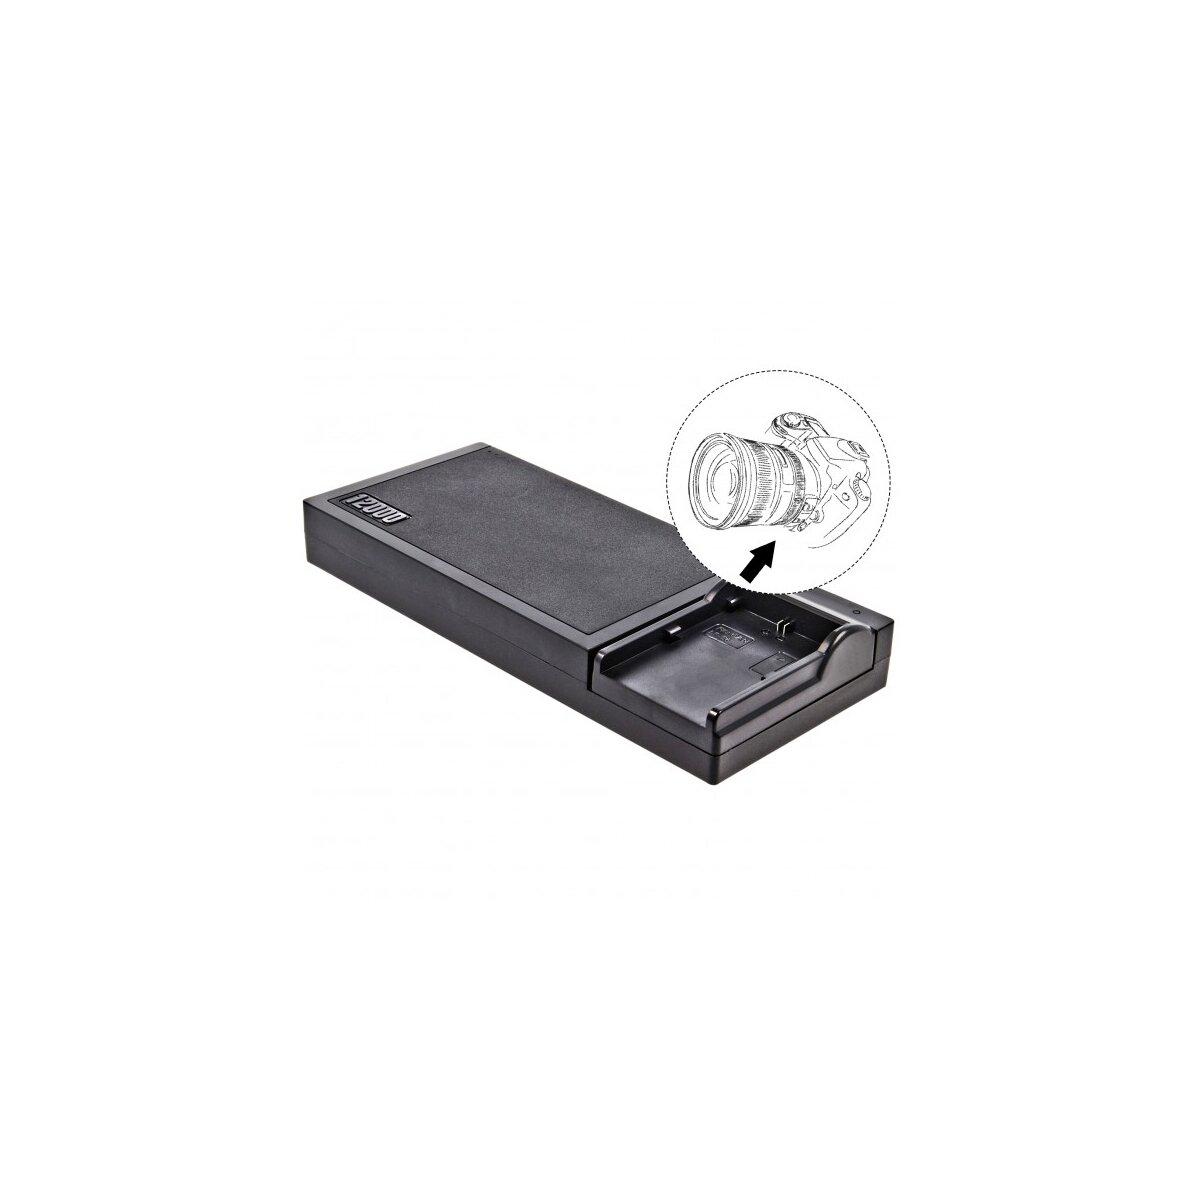 Multi DSLR Ladestation kompatibel für LP-E6 und USB - 12000 mAh